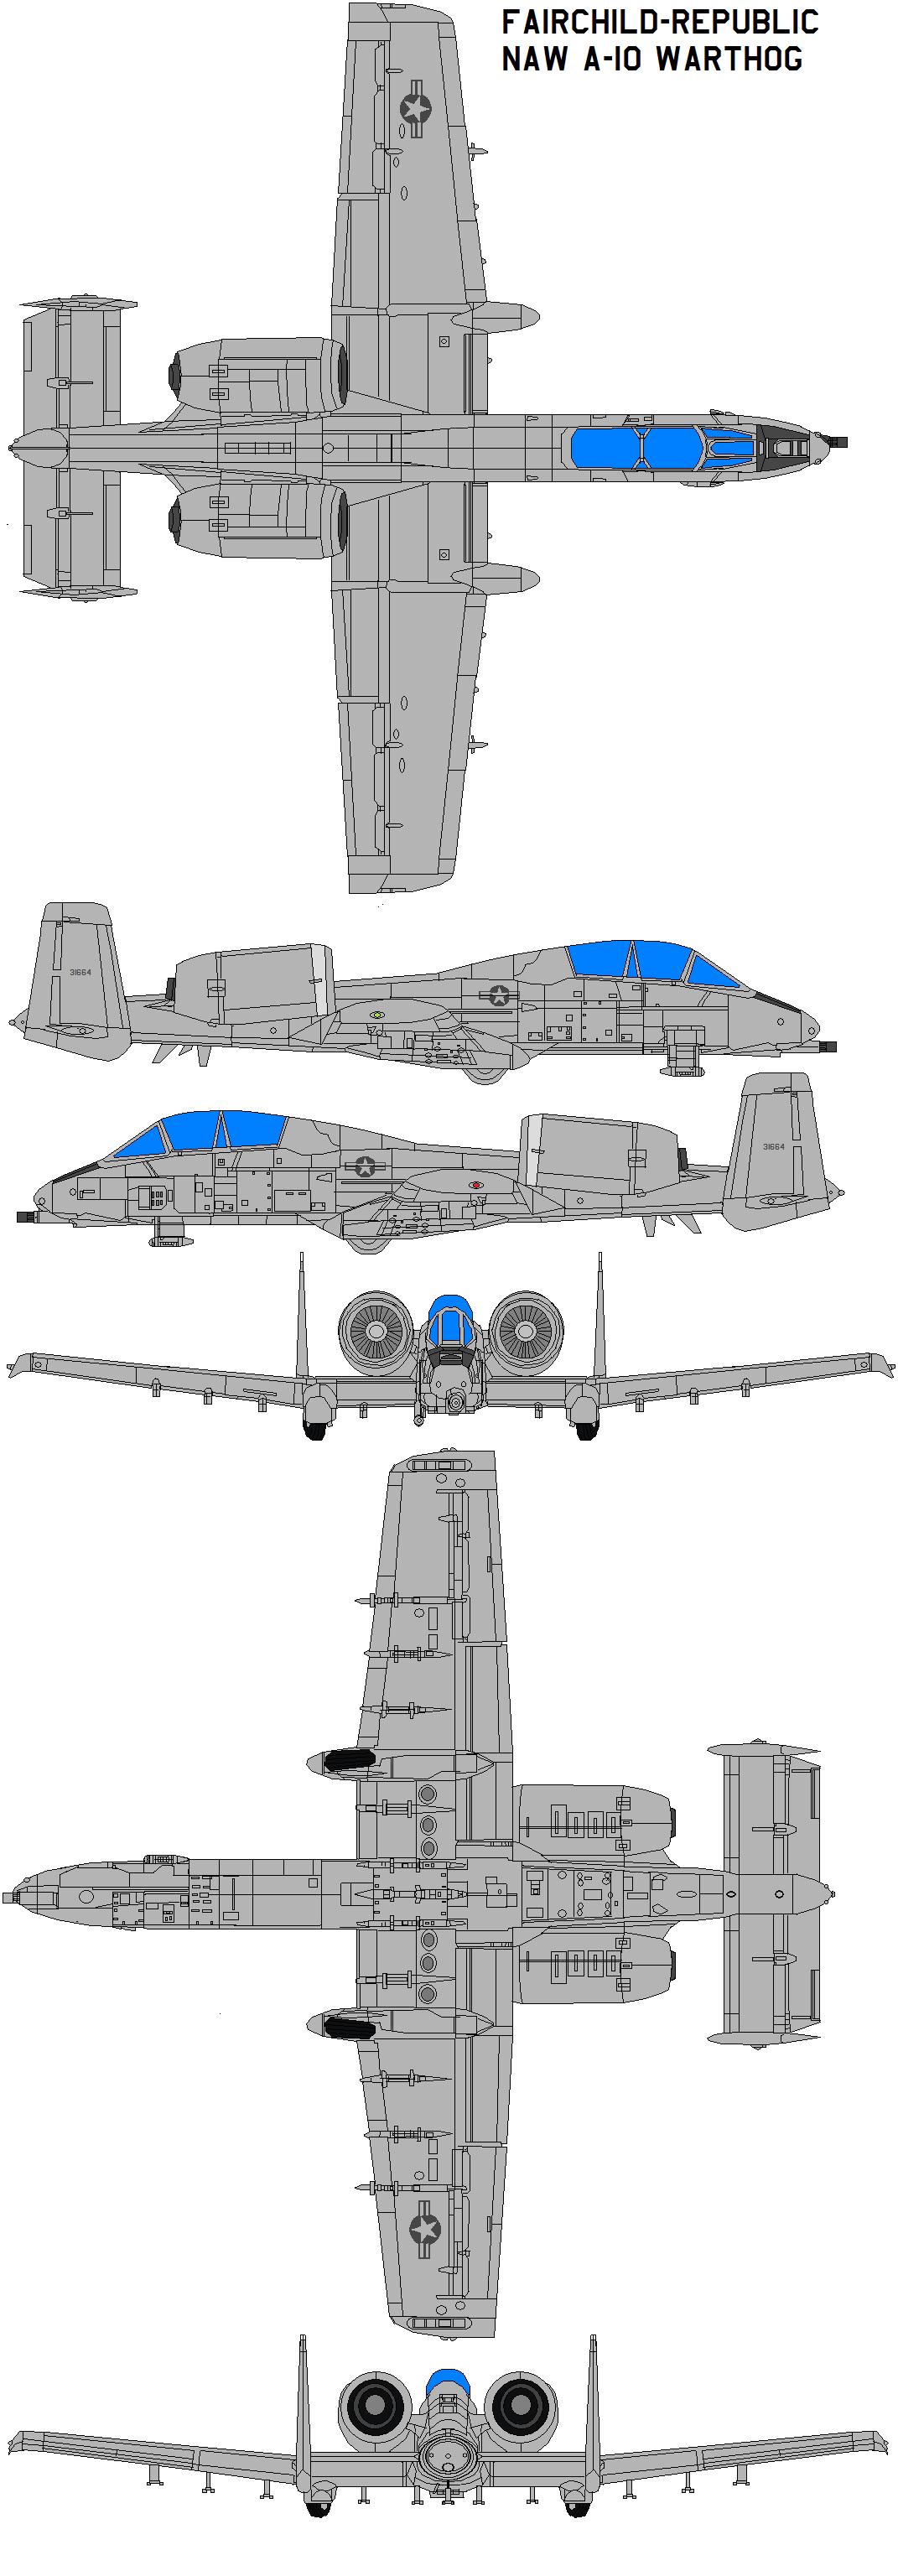 Fairchild Naw A 10 Warthog By Bagera Viantart On